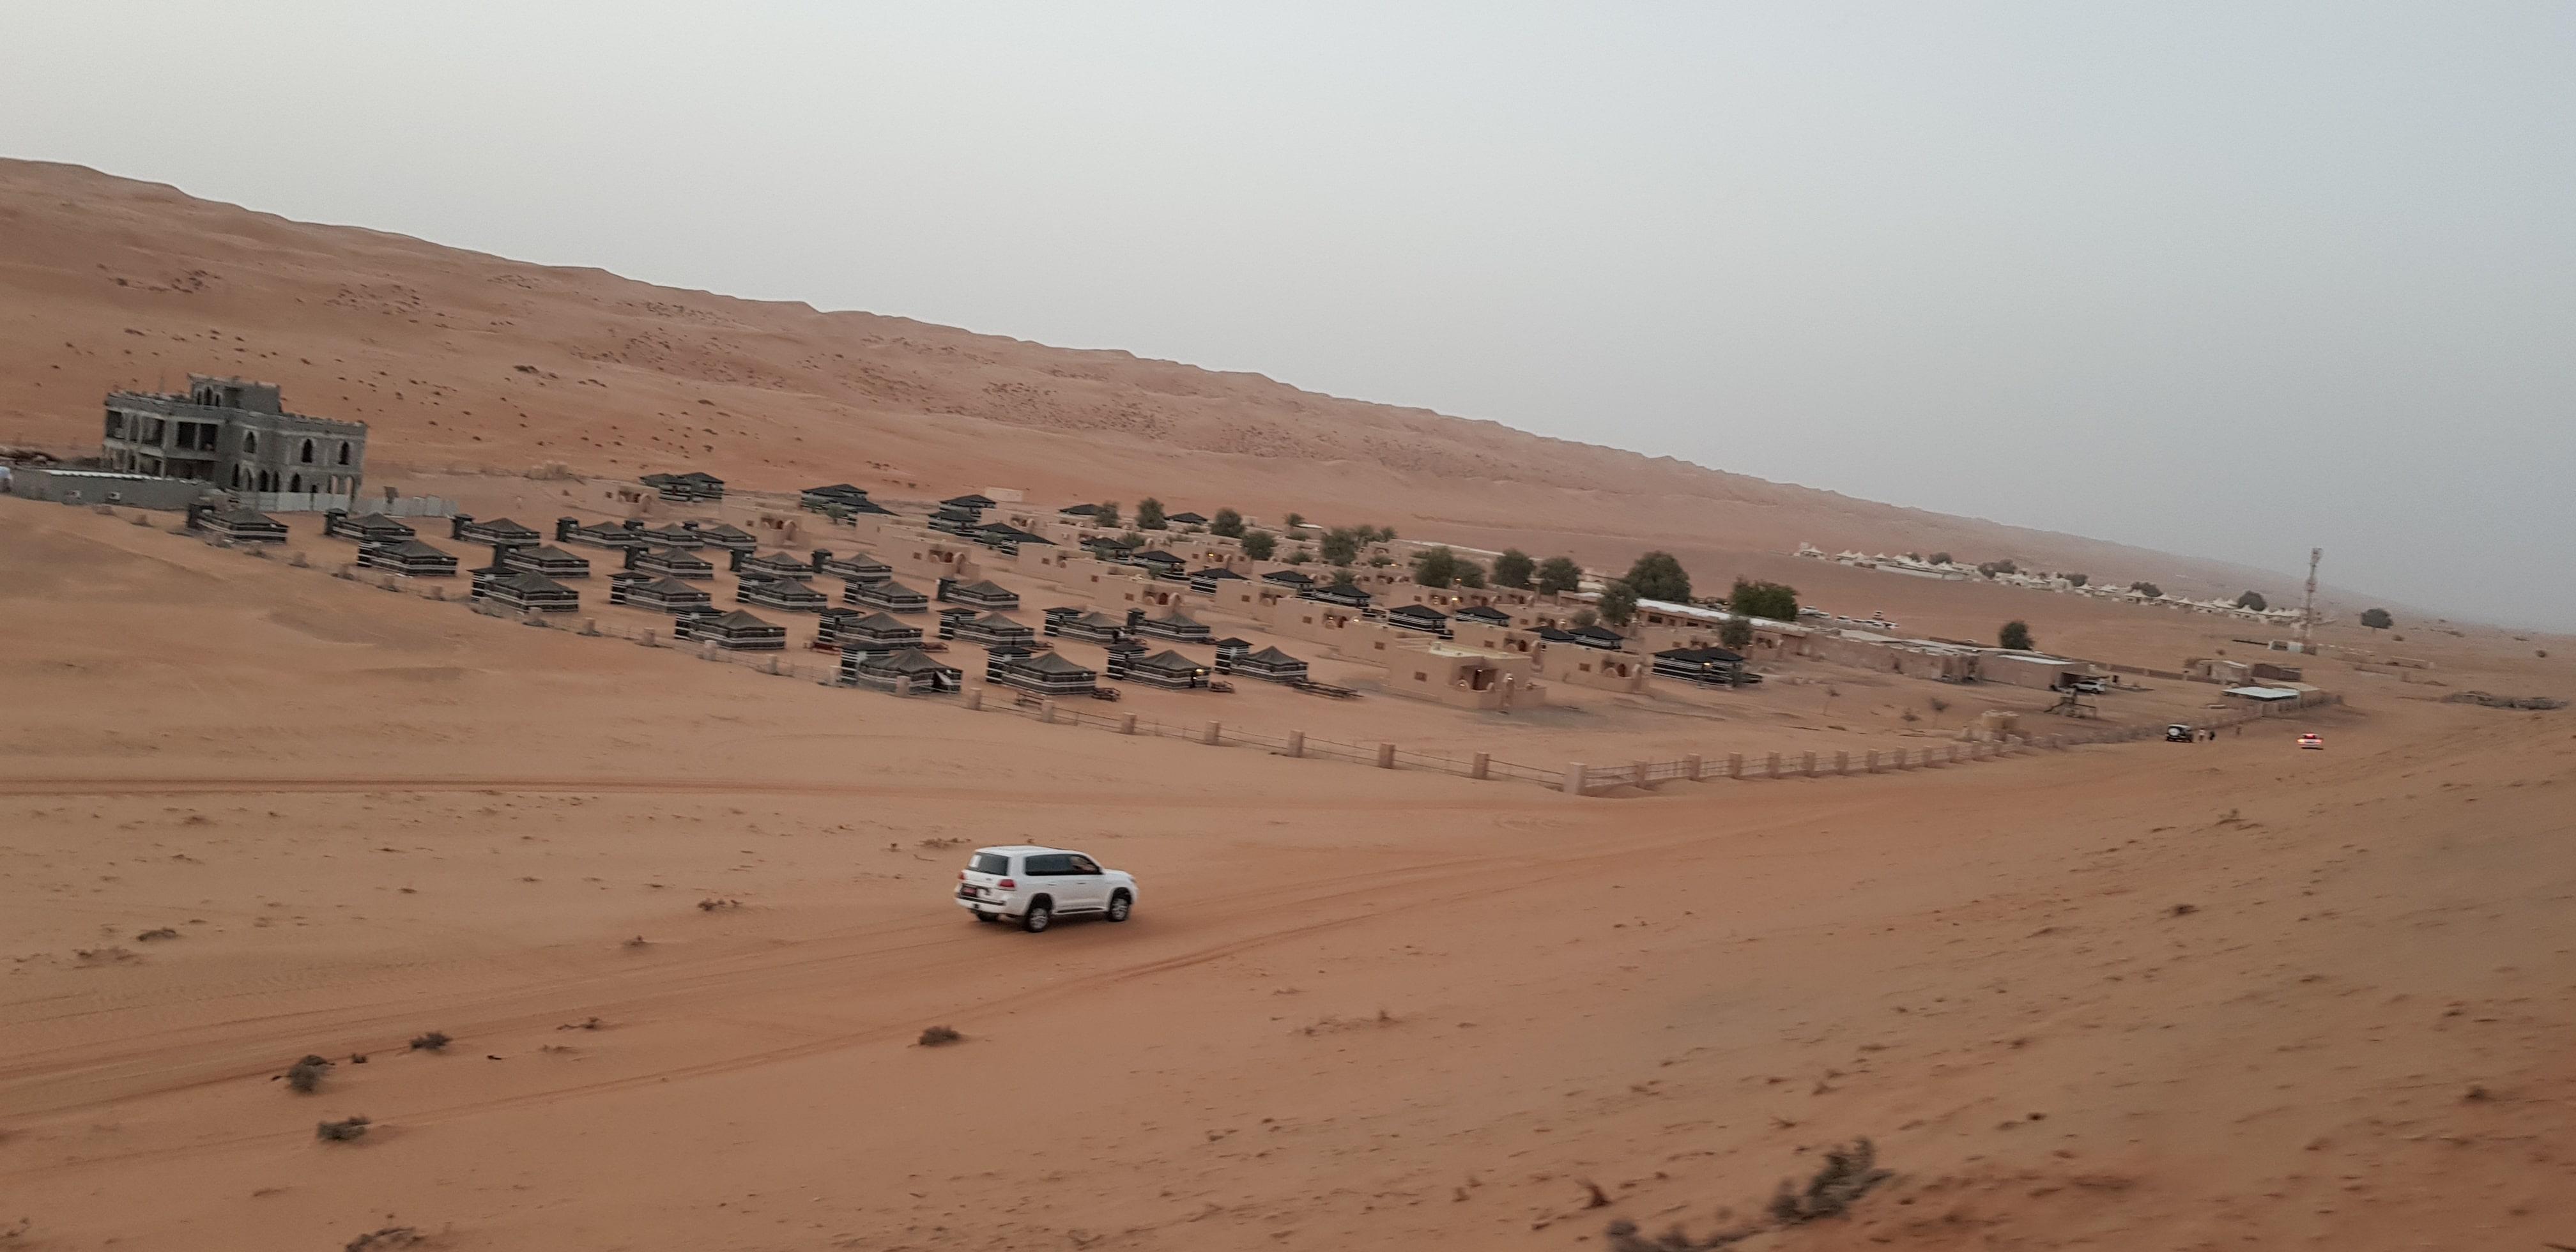 Il campo tendato Arabian Oryx Camp, Al Wasil, Wahiba Sands